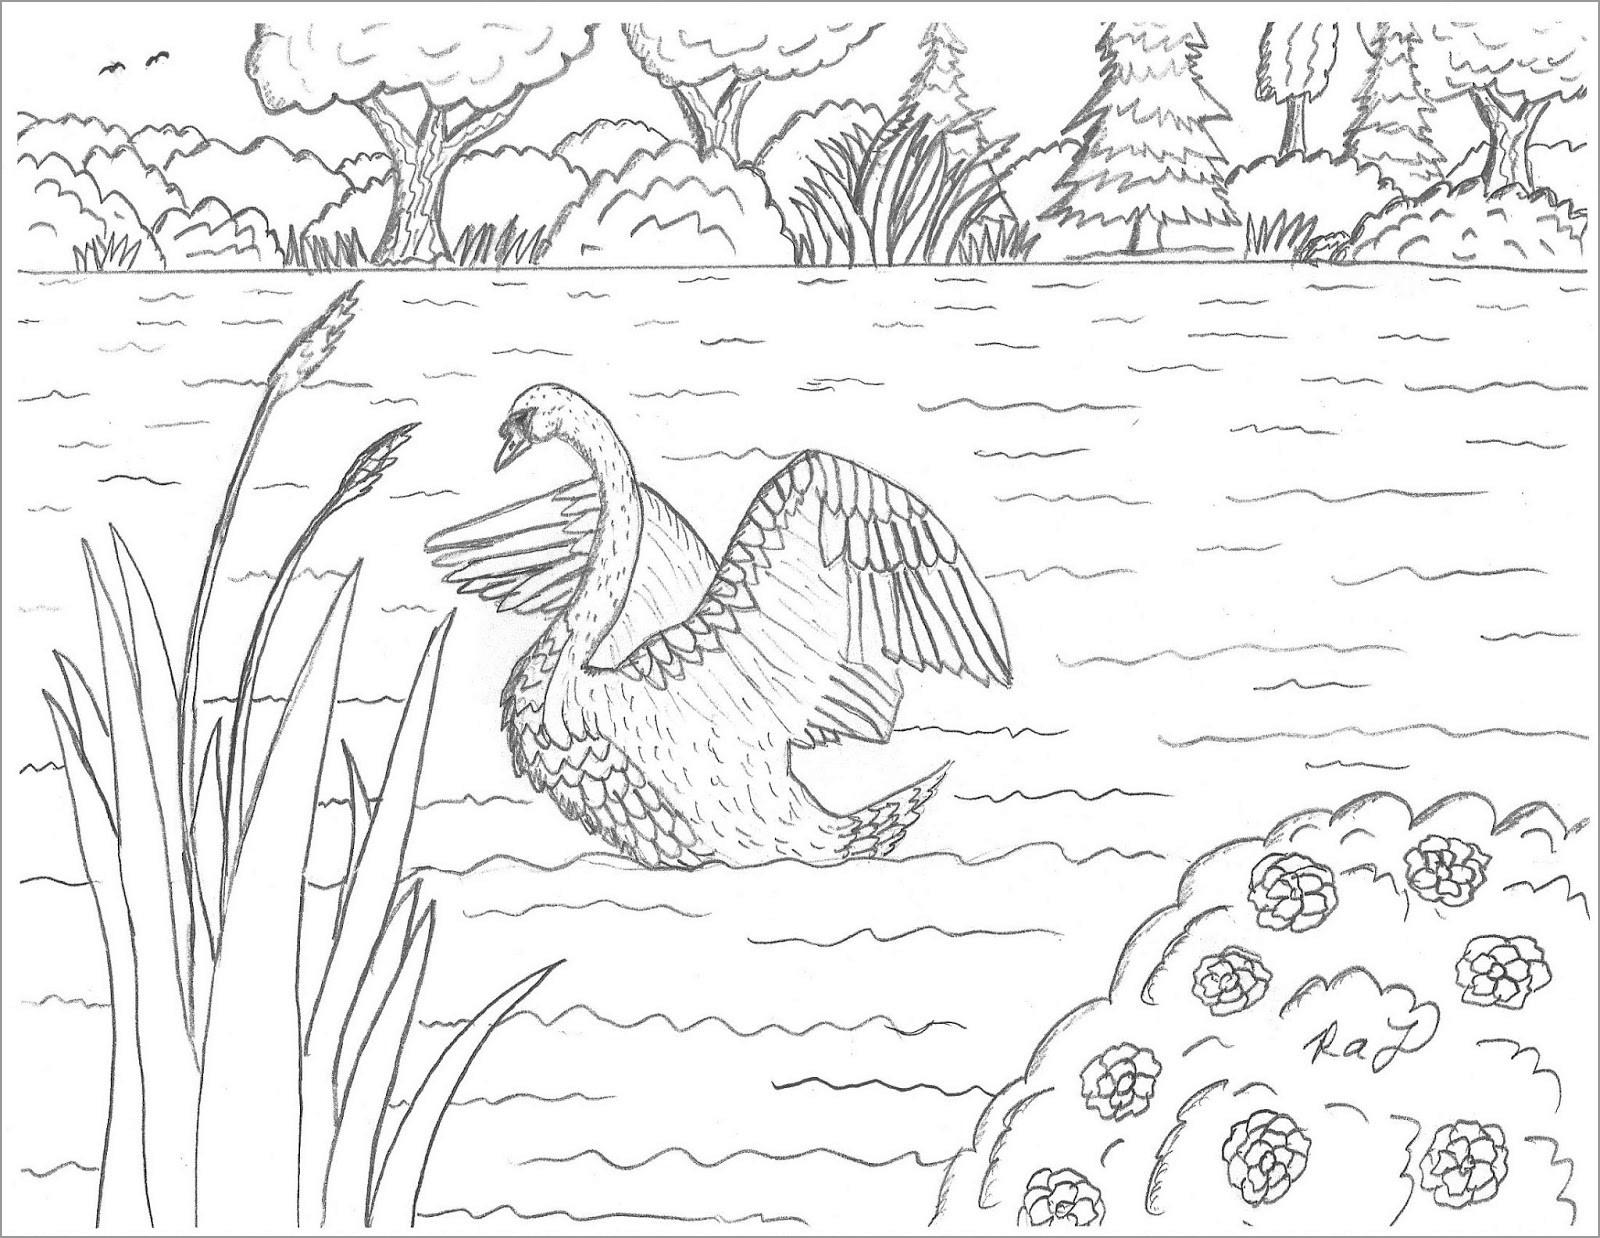 Swan Lake Coloring Page to Print